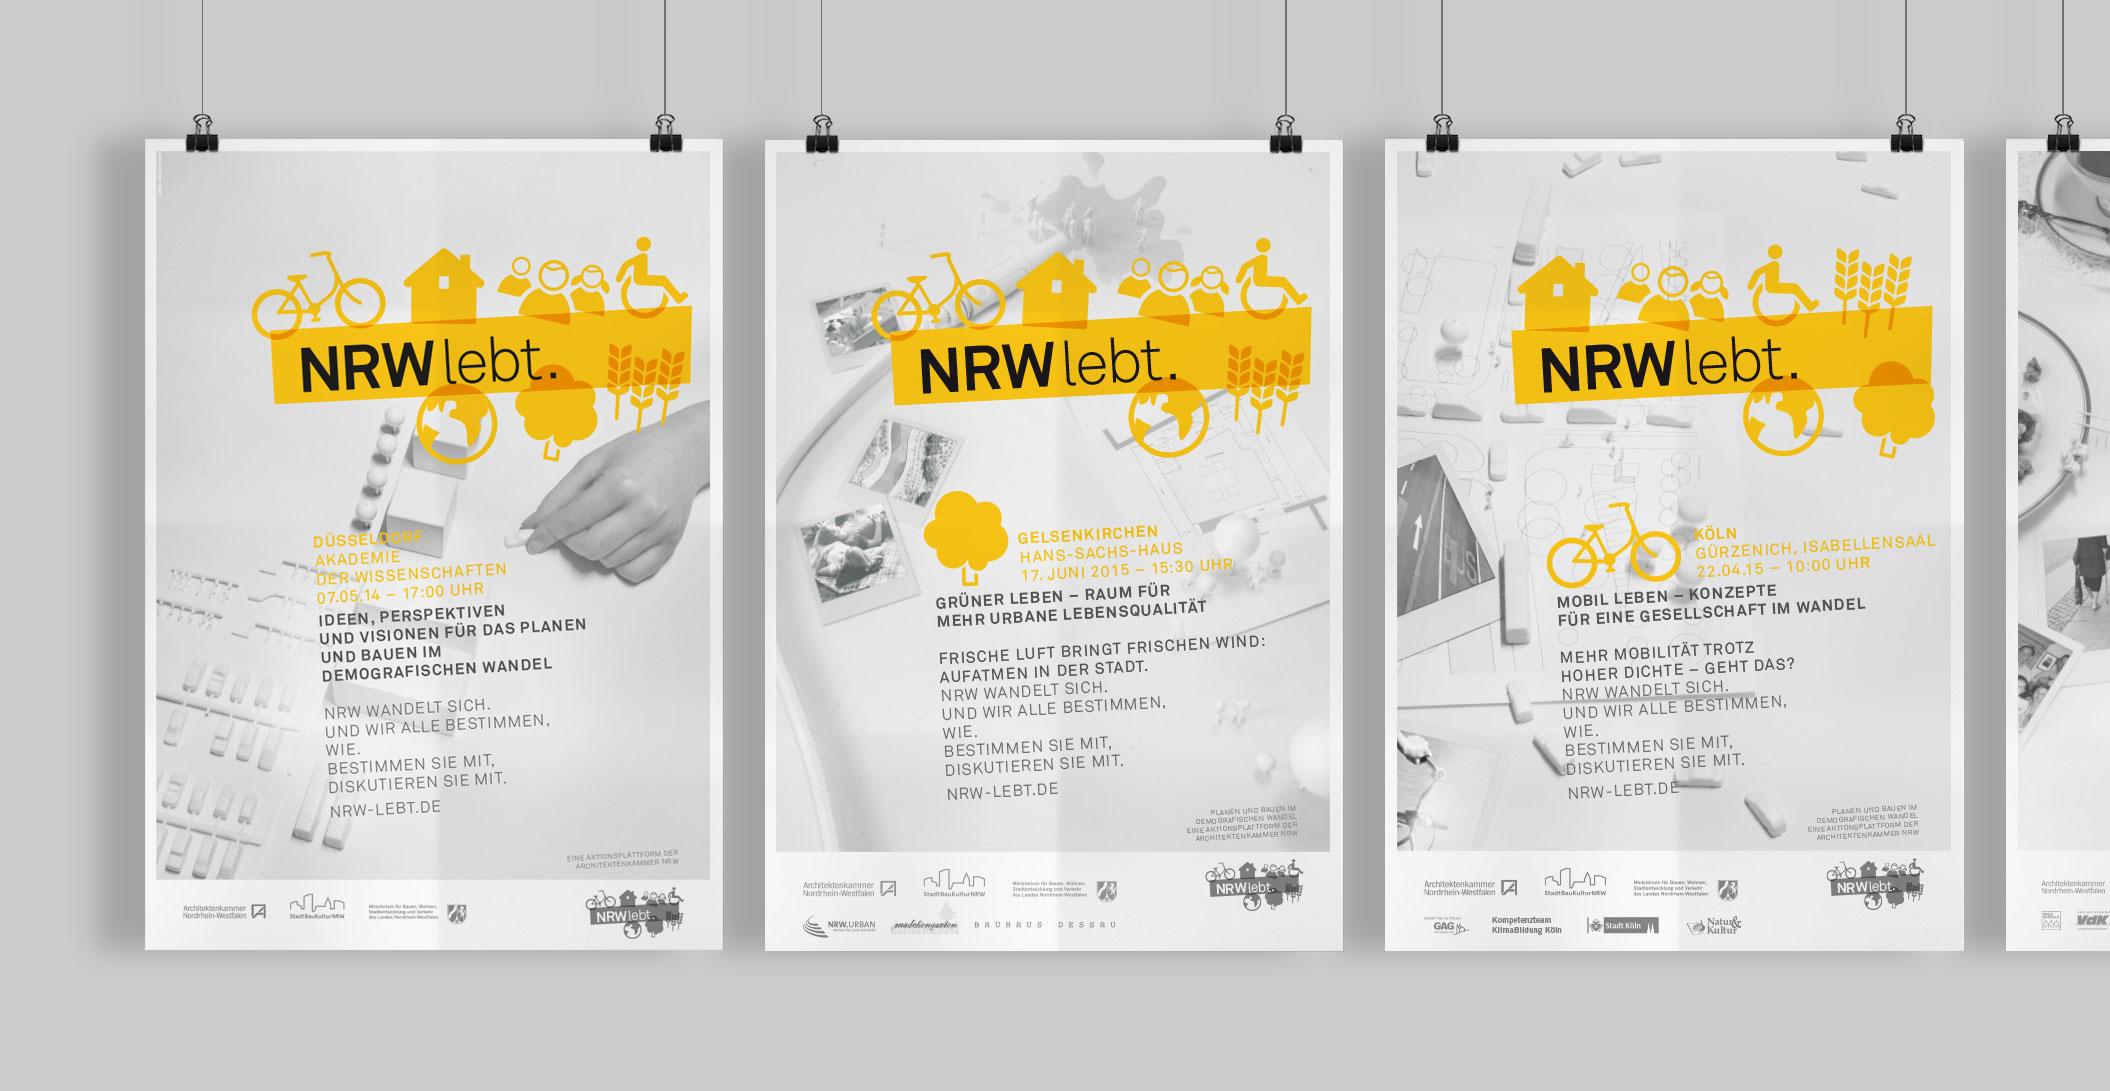 Veranstaltungsplakate – 8 Motive - Architektenkammer NRW - NRW lebt.